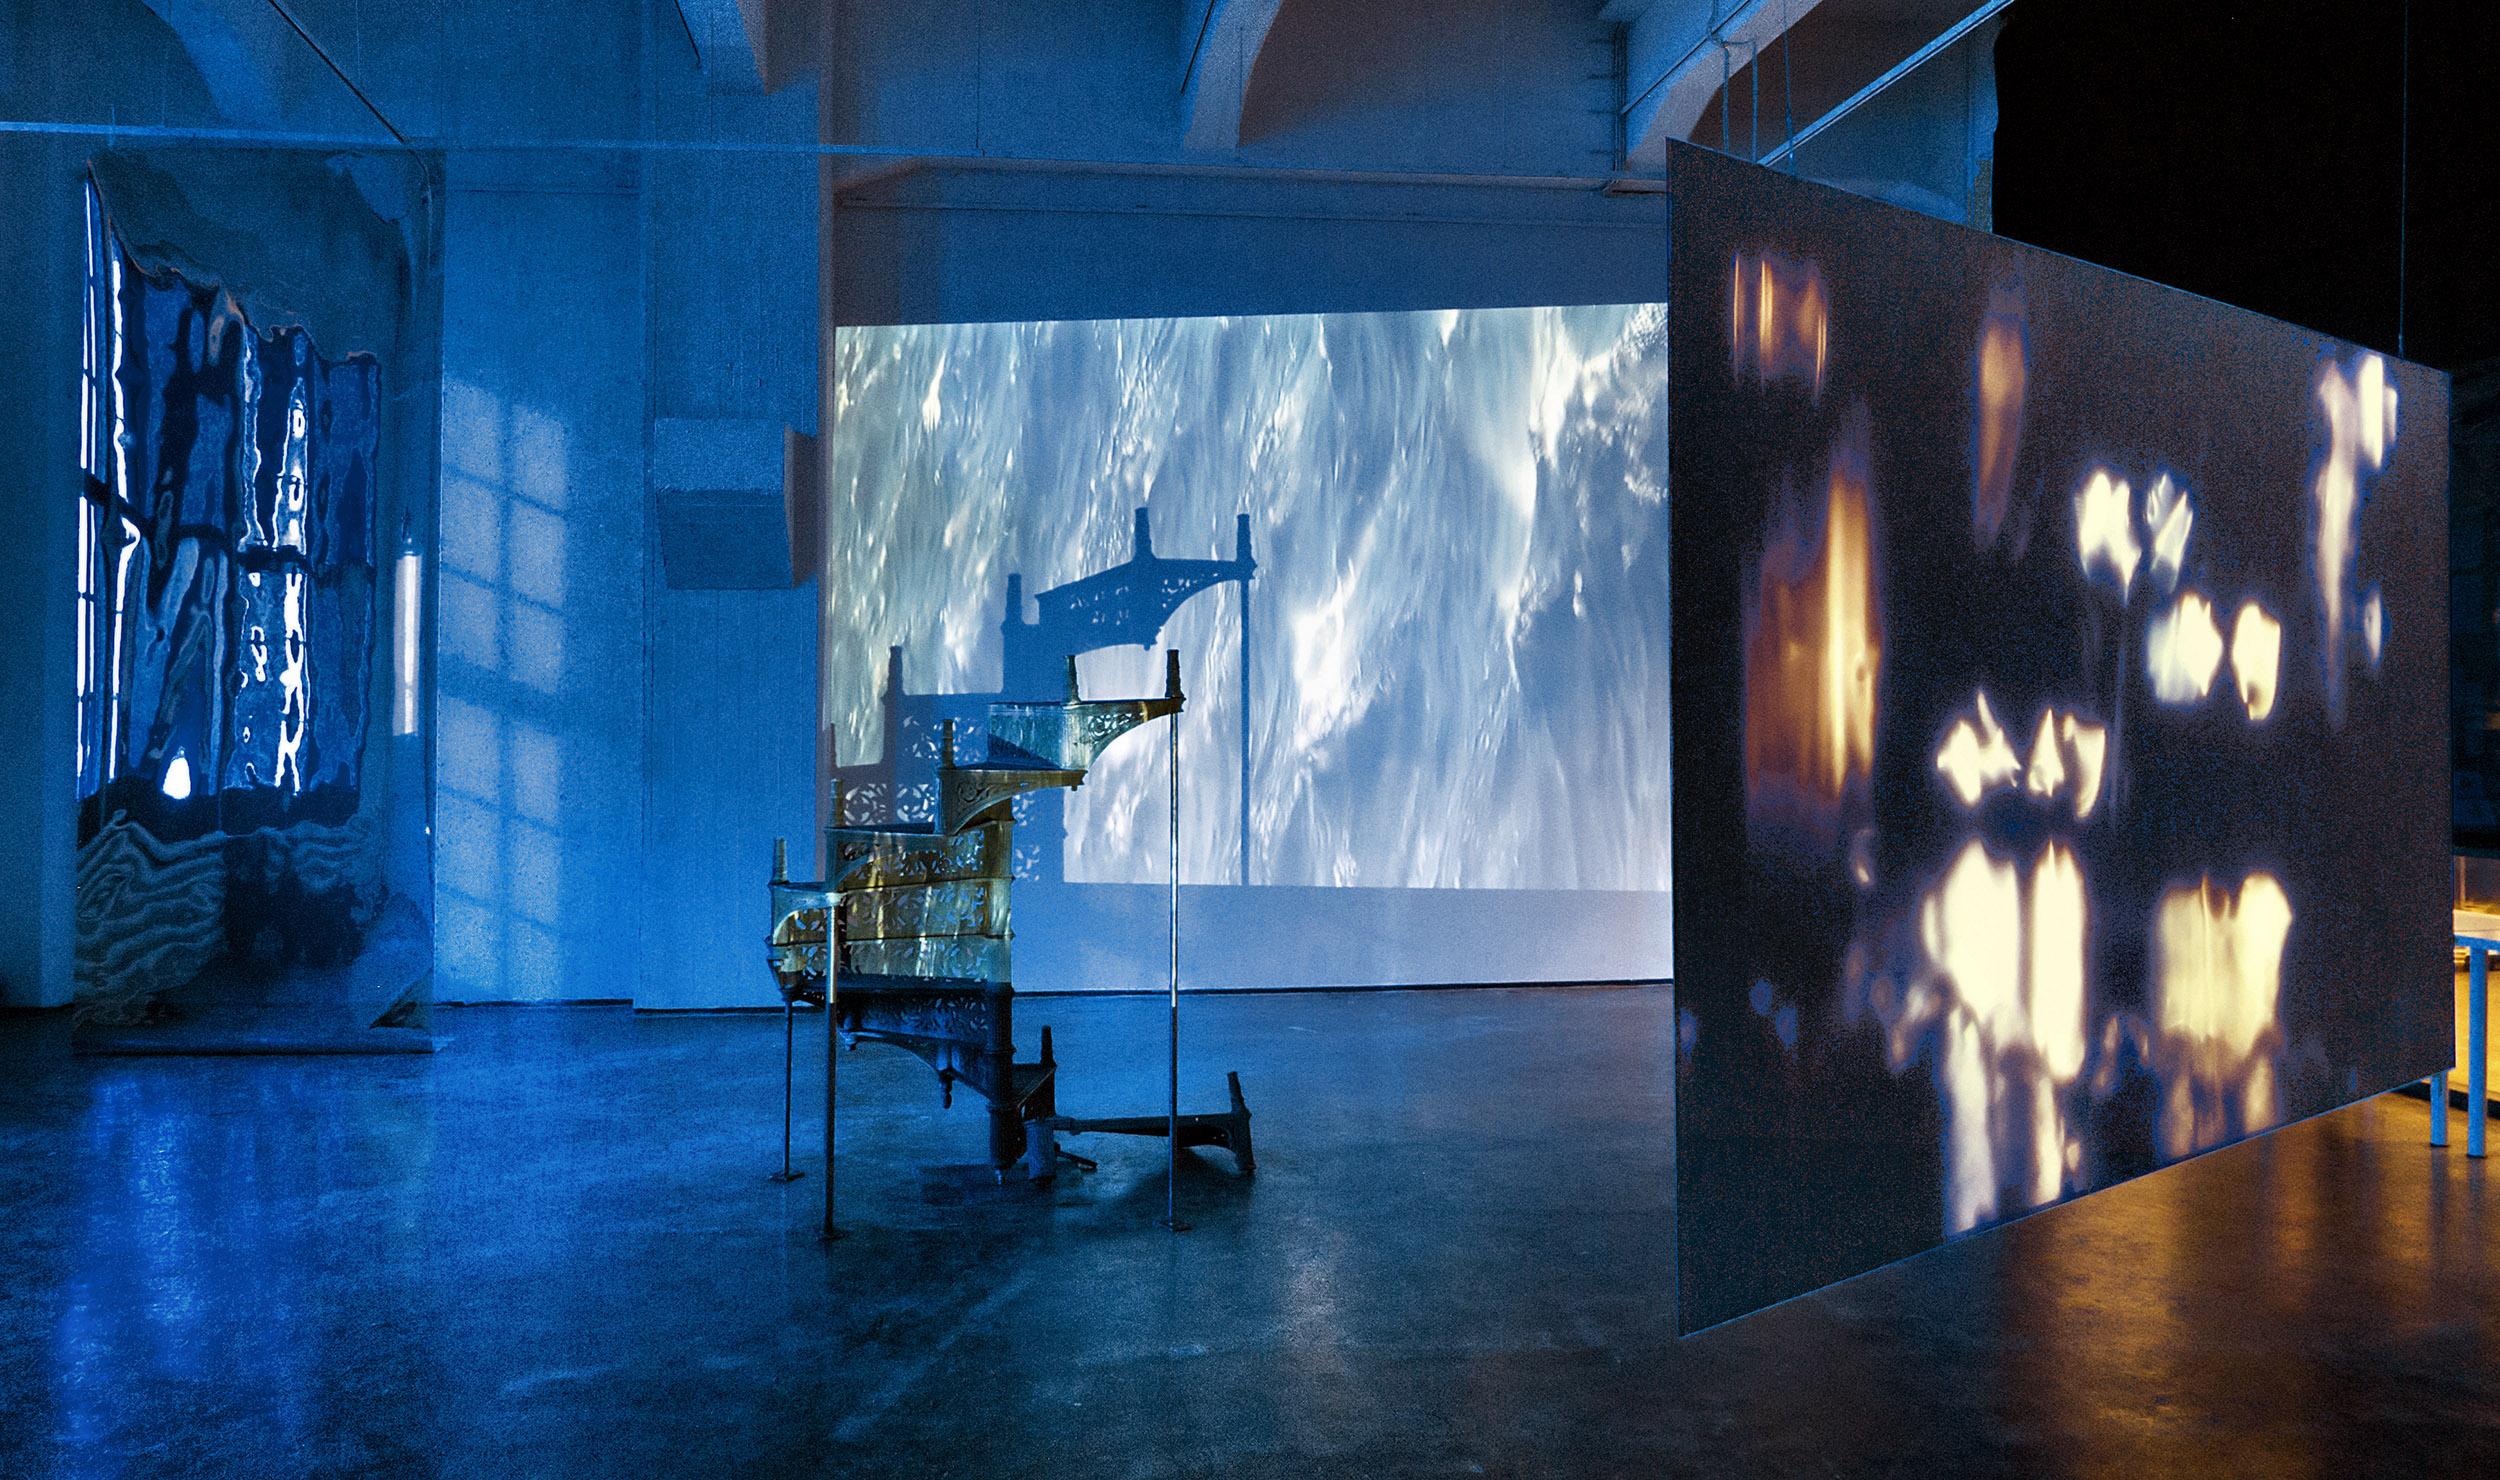 Rita Jokiranta,  Between Strength and Weakness , 2013, multi-channel video installation. Installation view.